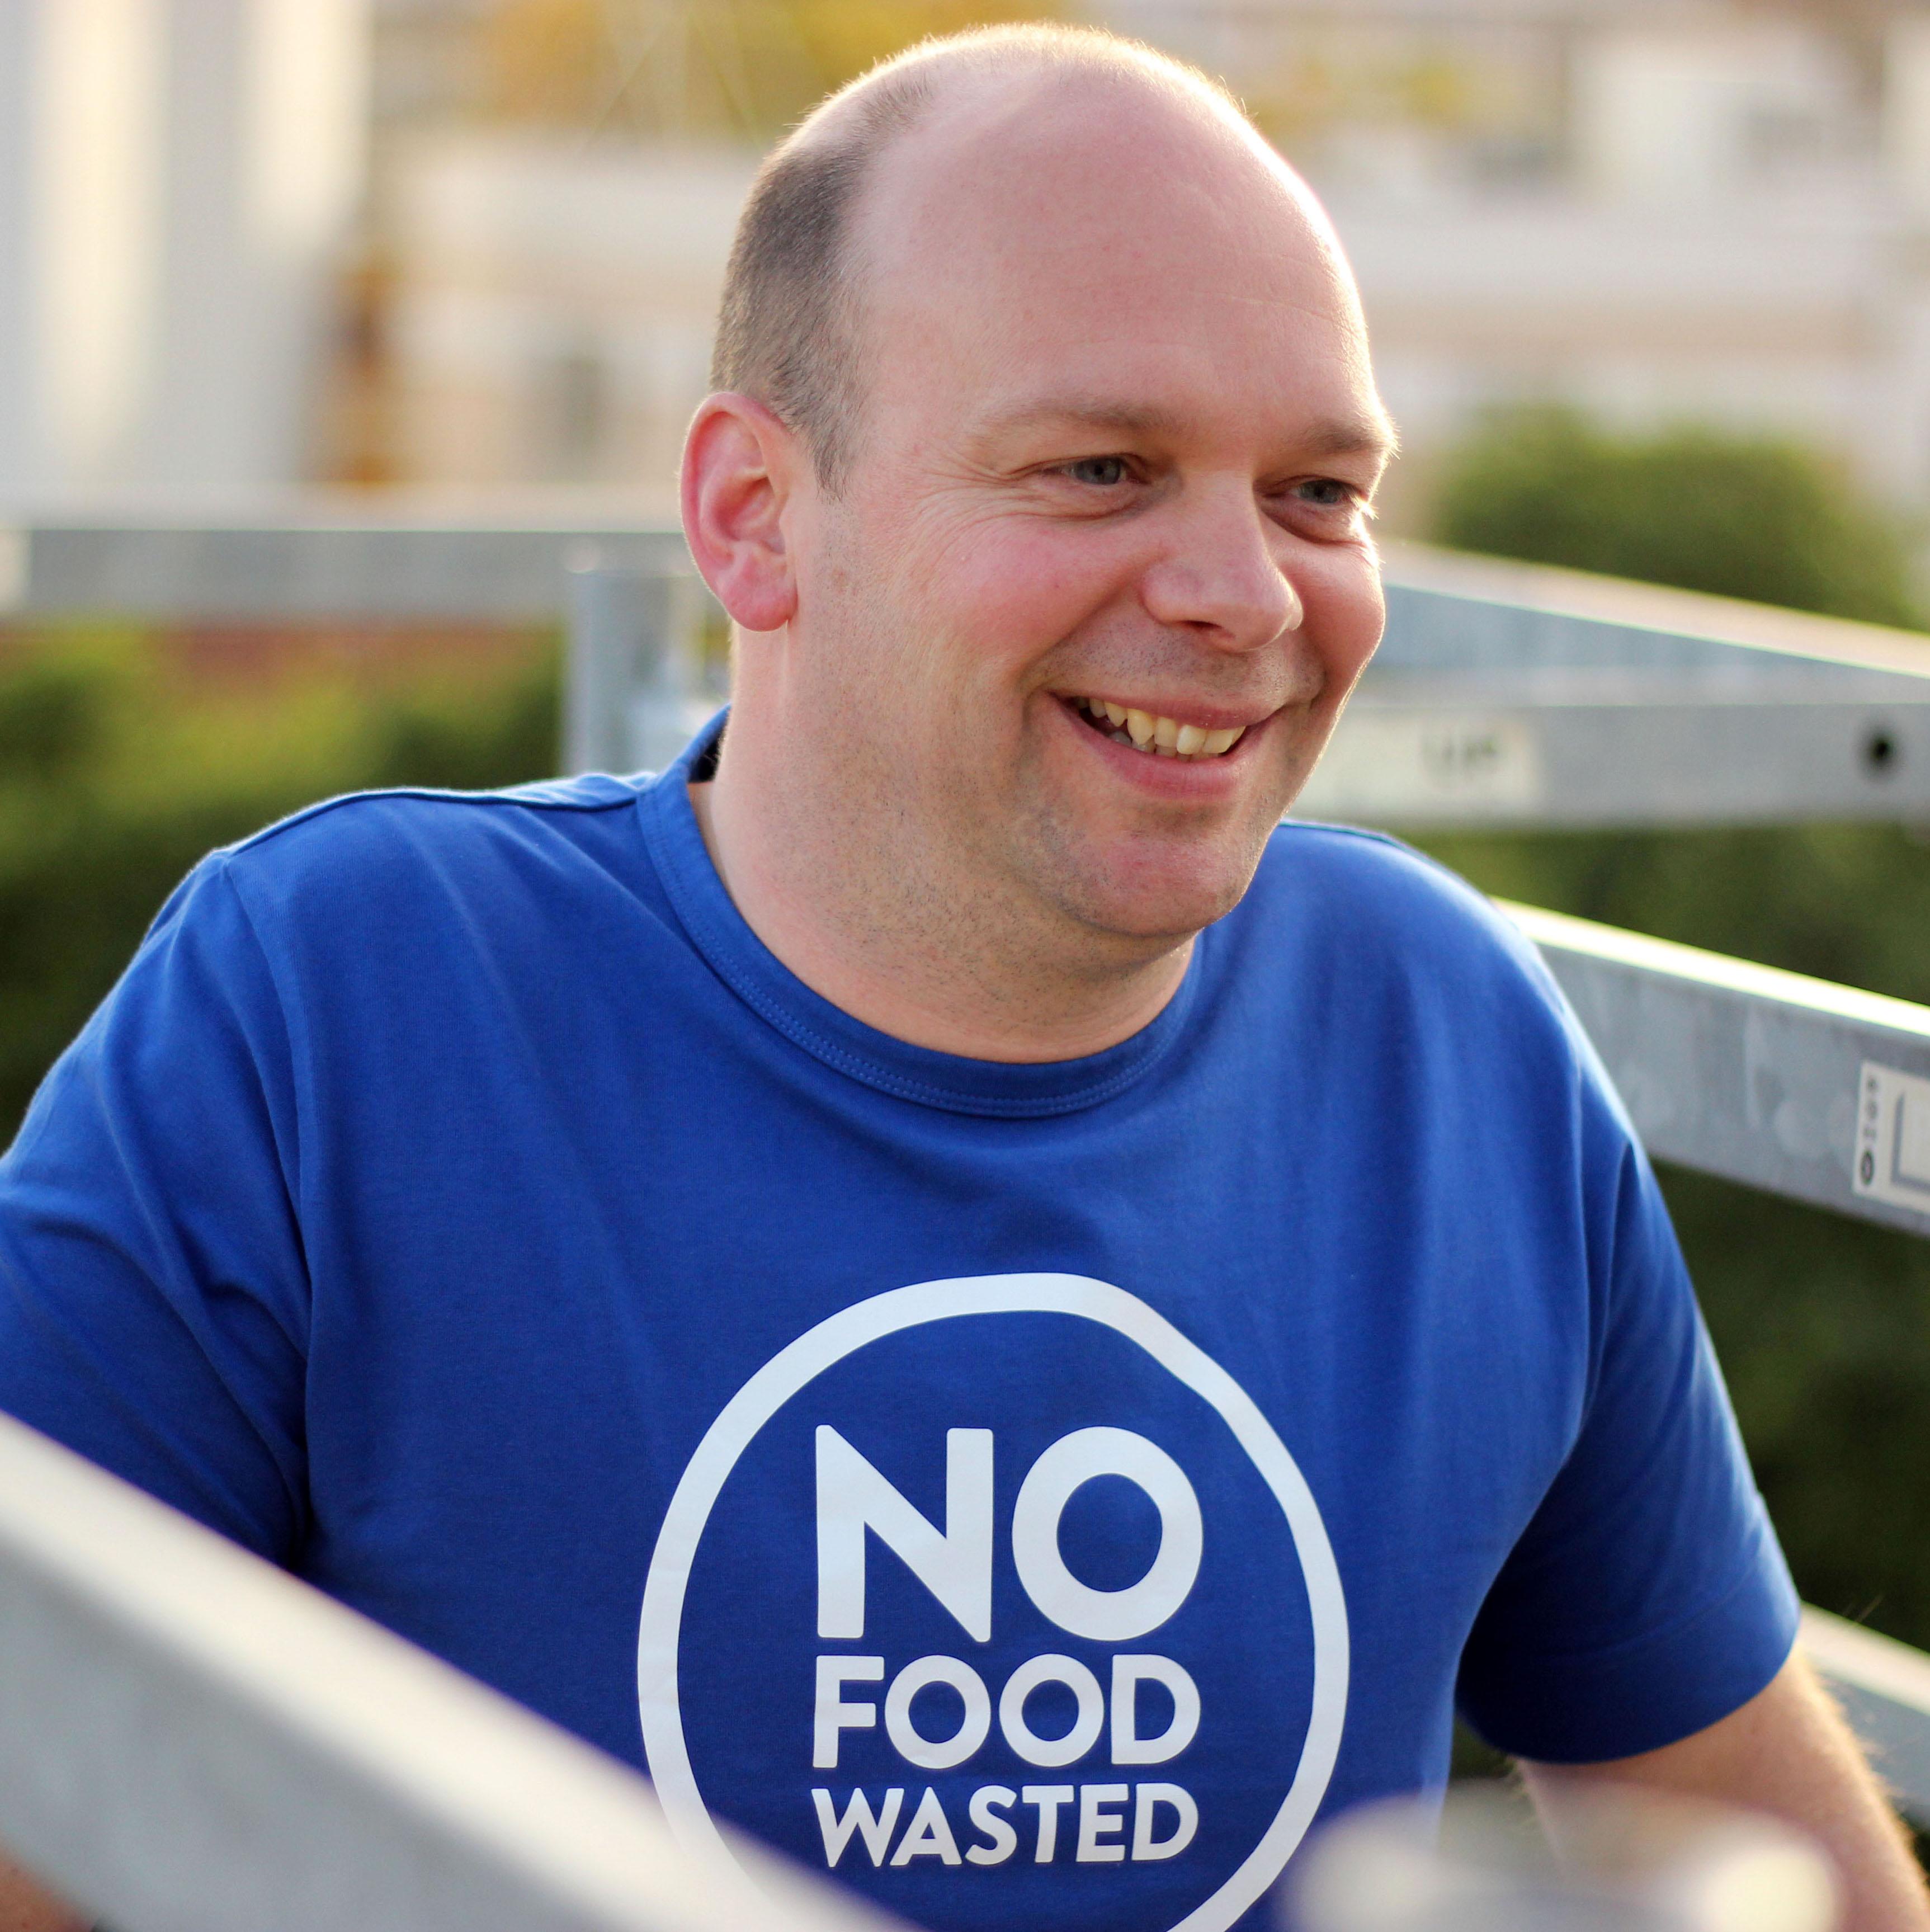 Samen Tegen Voedselverspilling - Stakeholders - August de Vocht - Oprichter NoFoodWasted